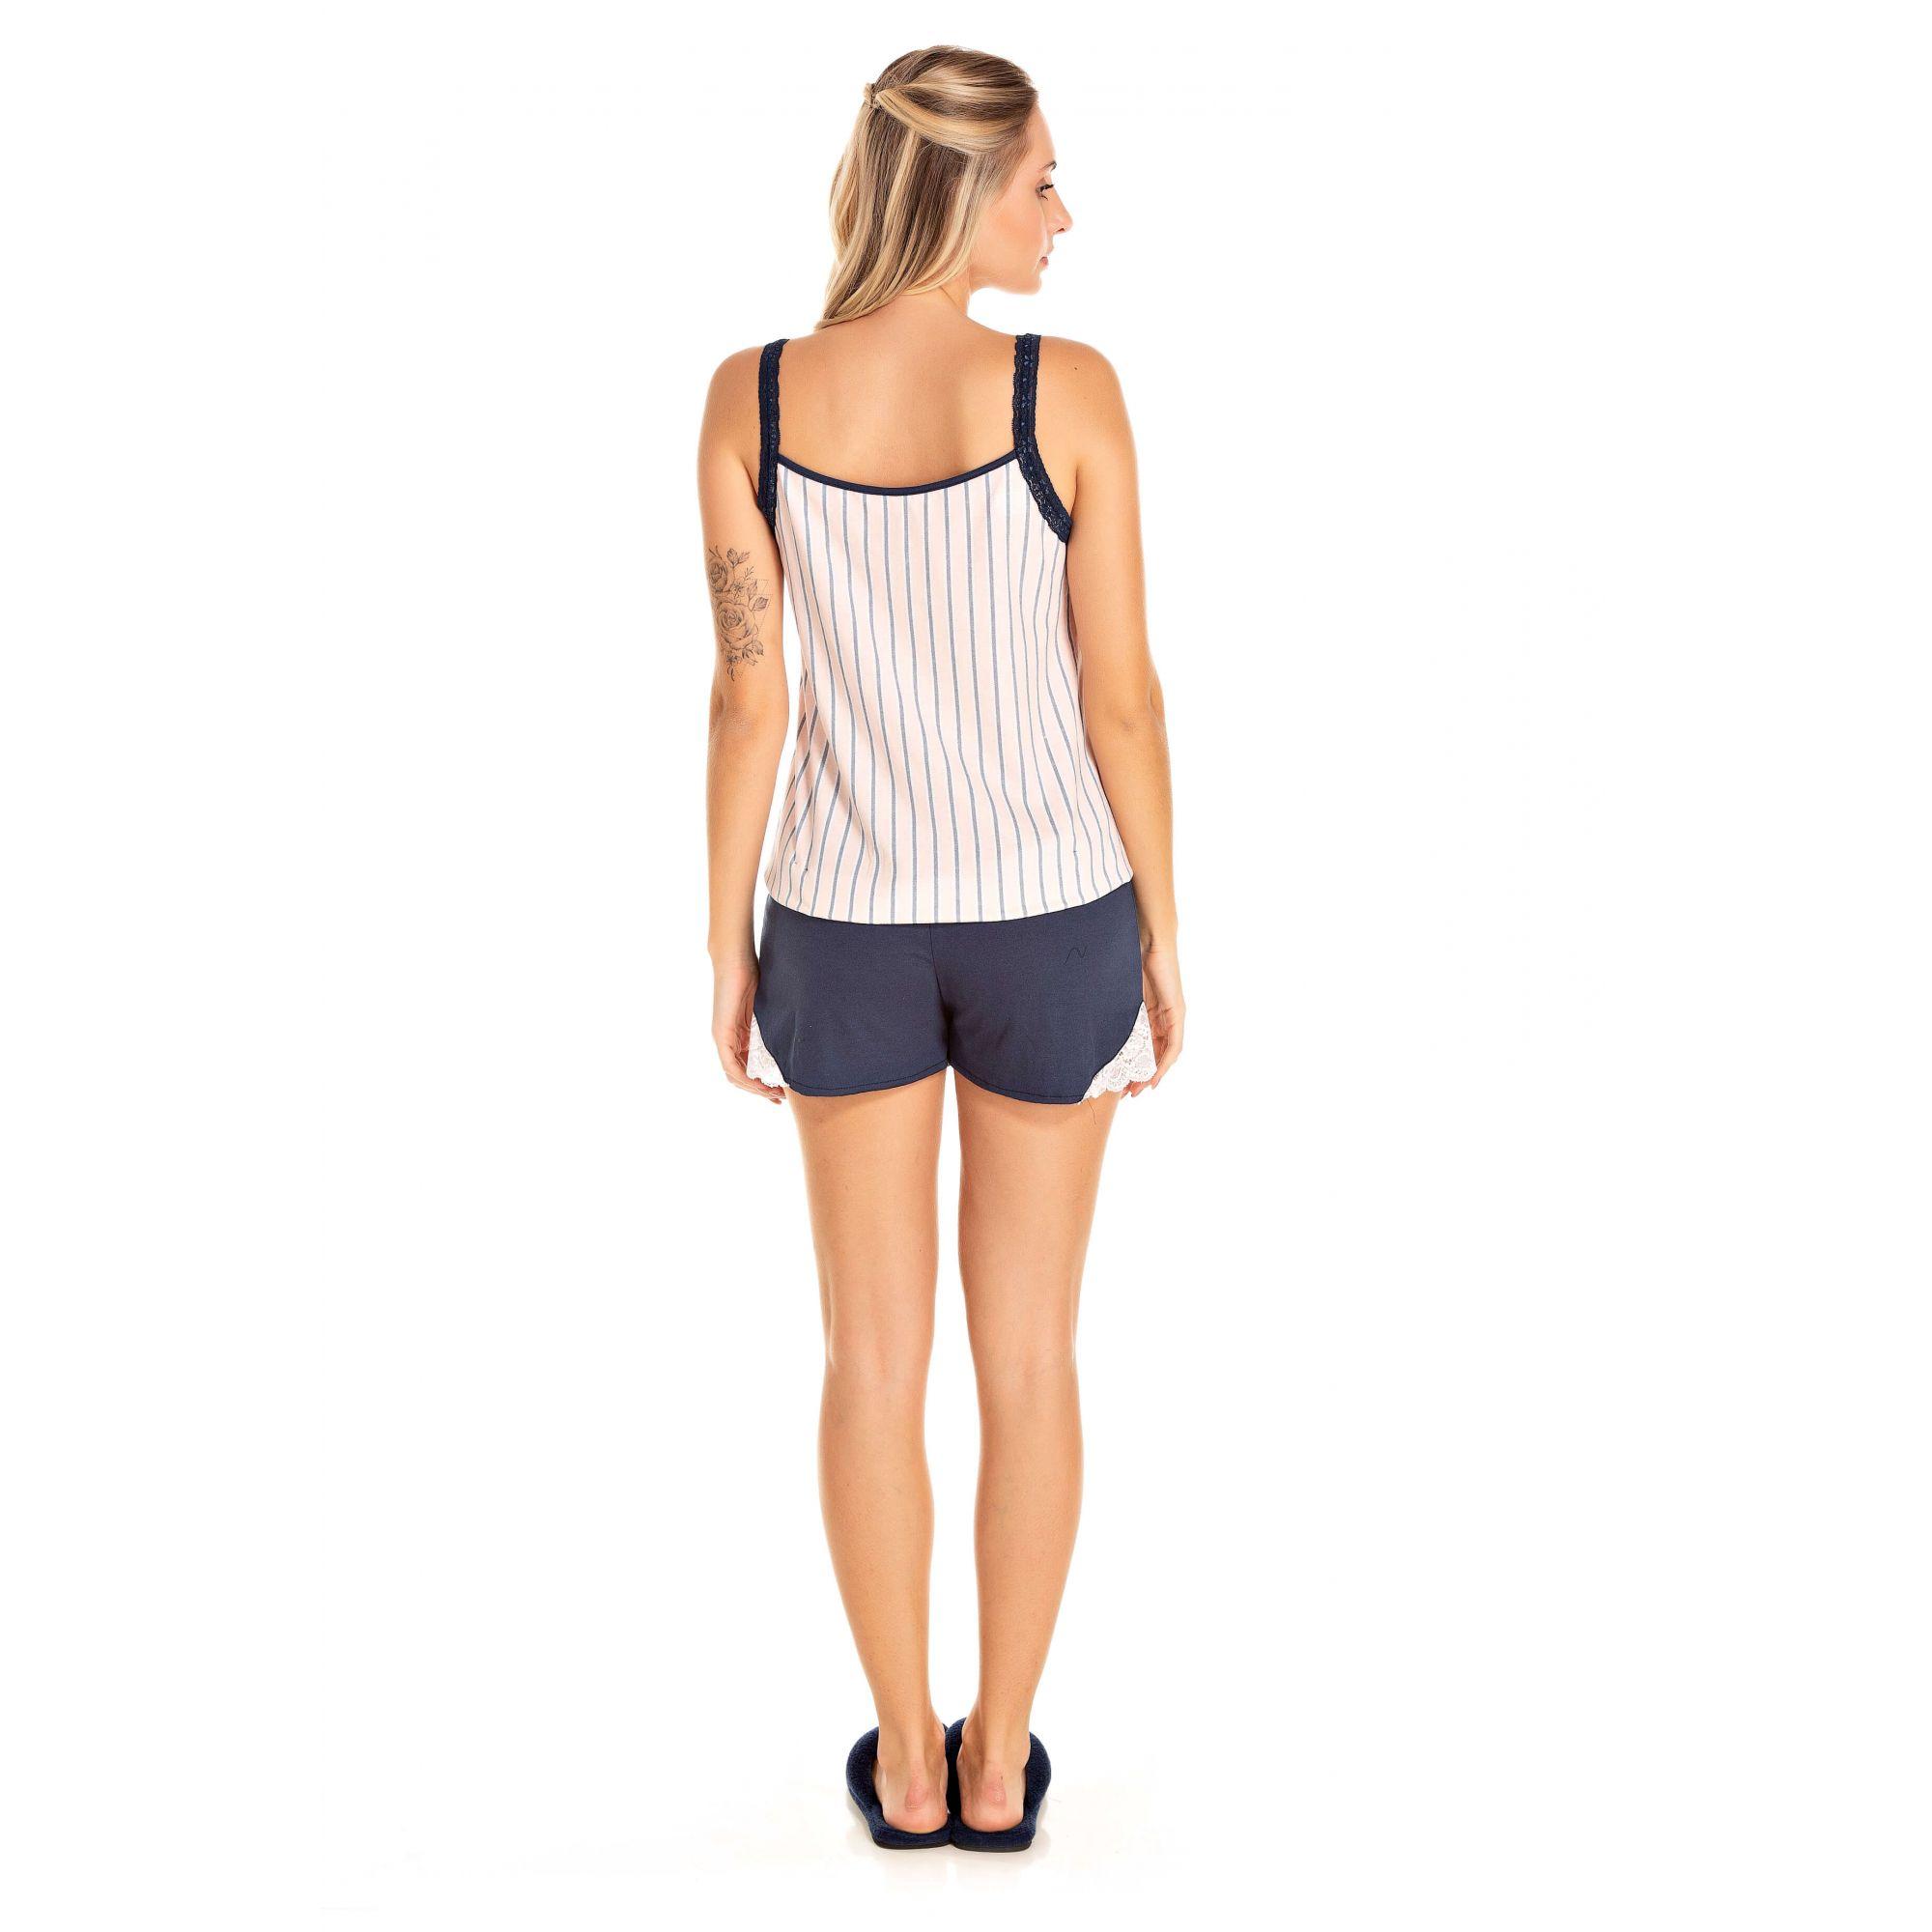 112/E - Short Doll Adulto Feminino Listrado